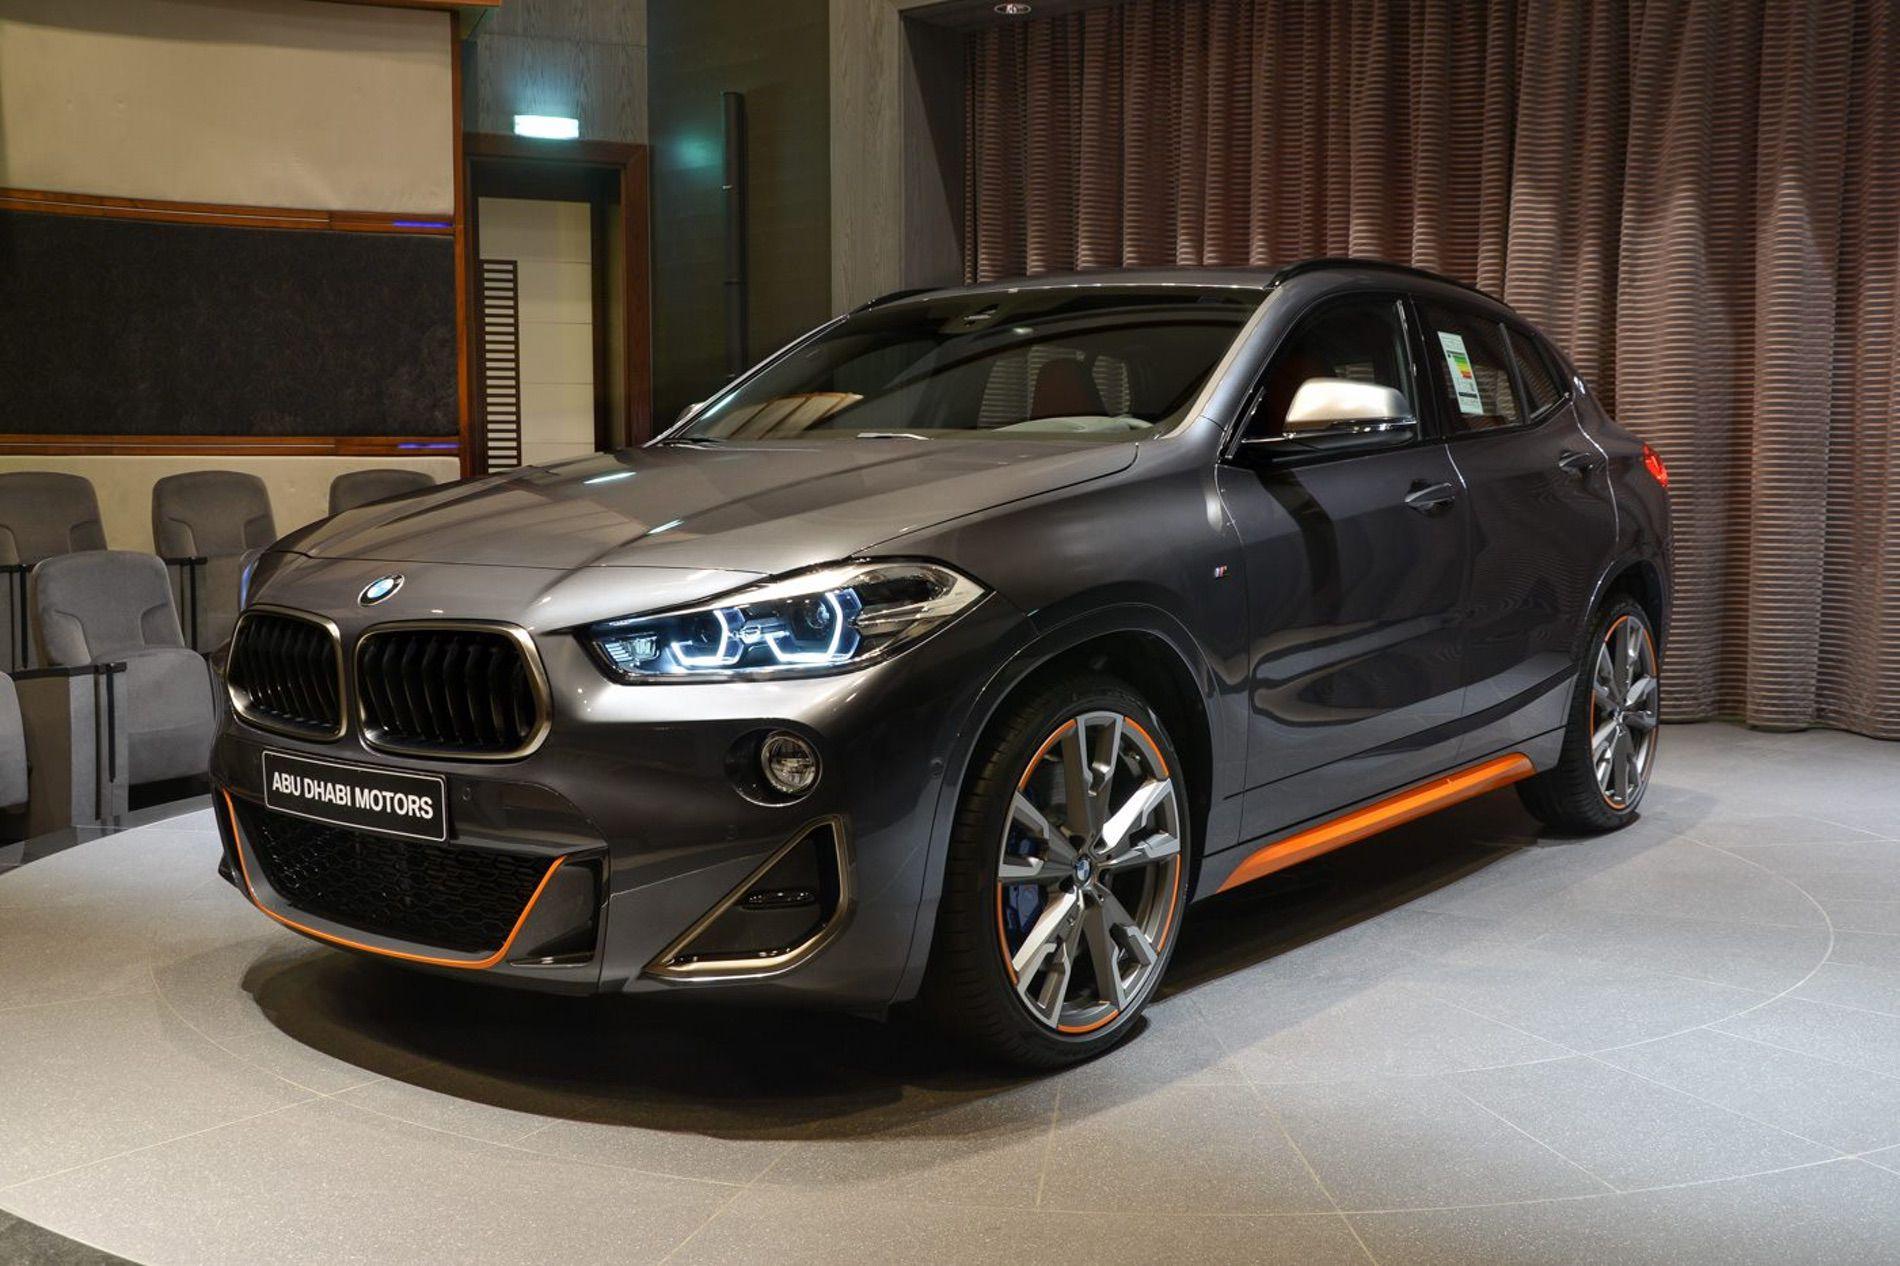 BMW X2 M35i gets some visual upgrades